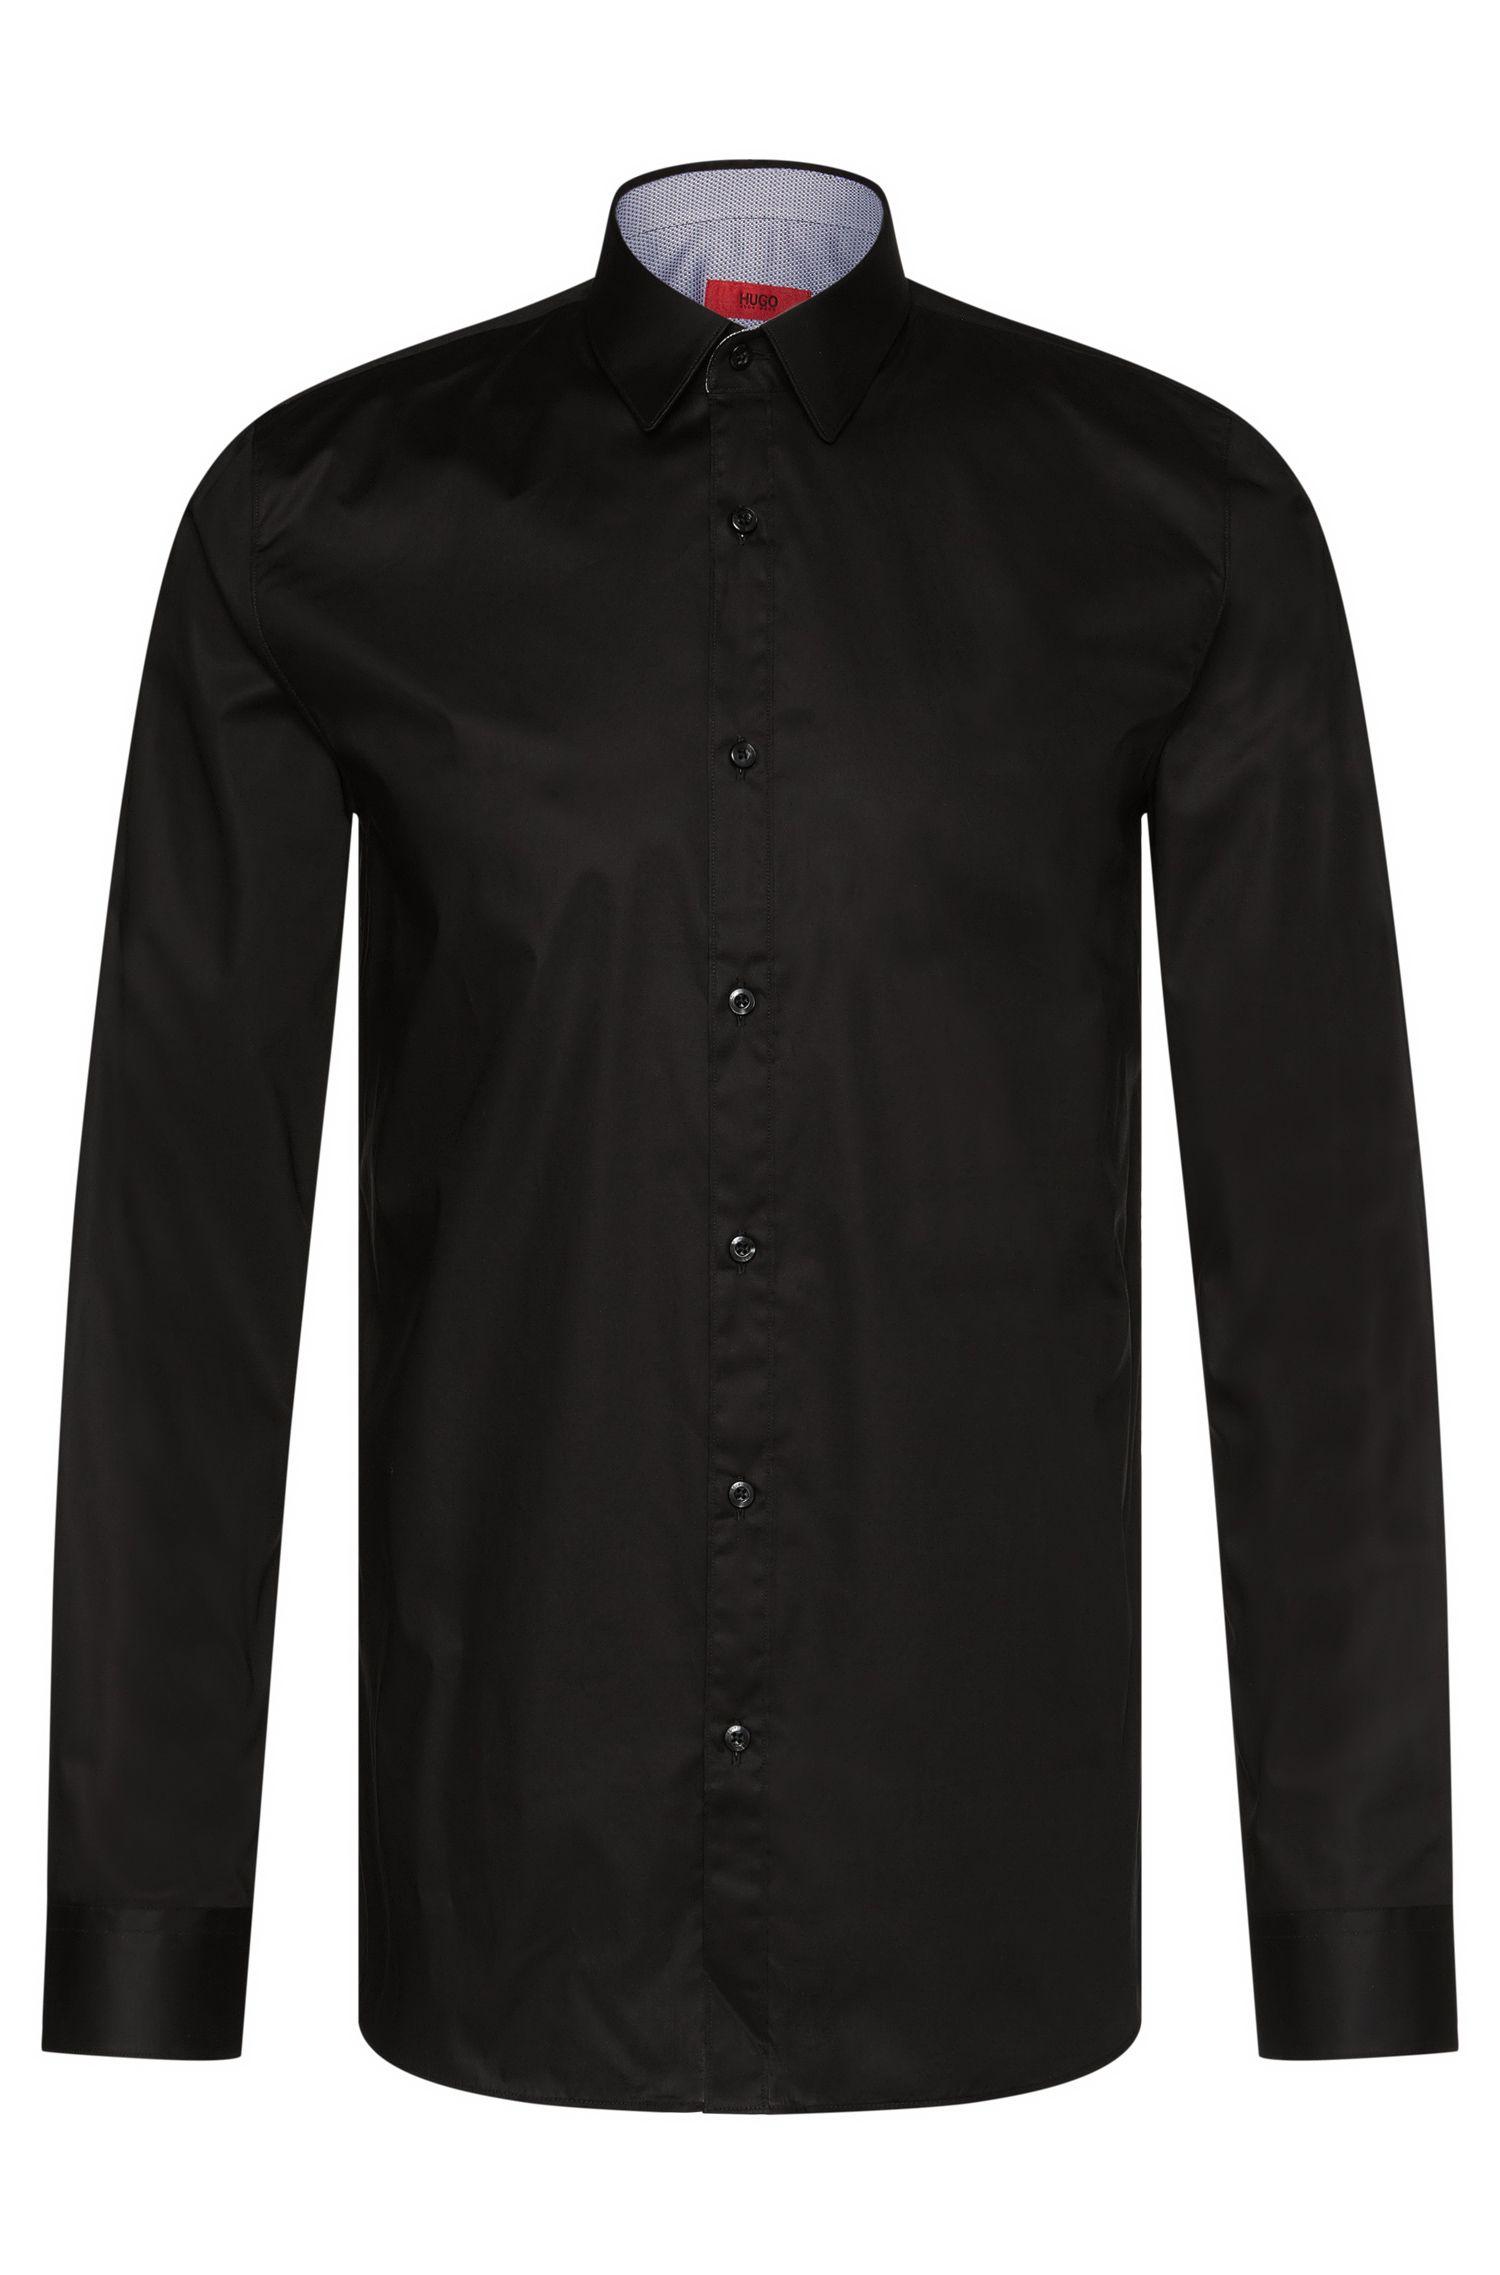 Unifarbenes Extra Slim-Fit Hemd aus Stretch-Baumwolle: 'Efin'